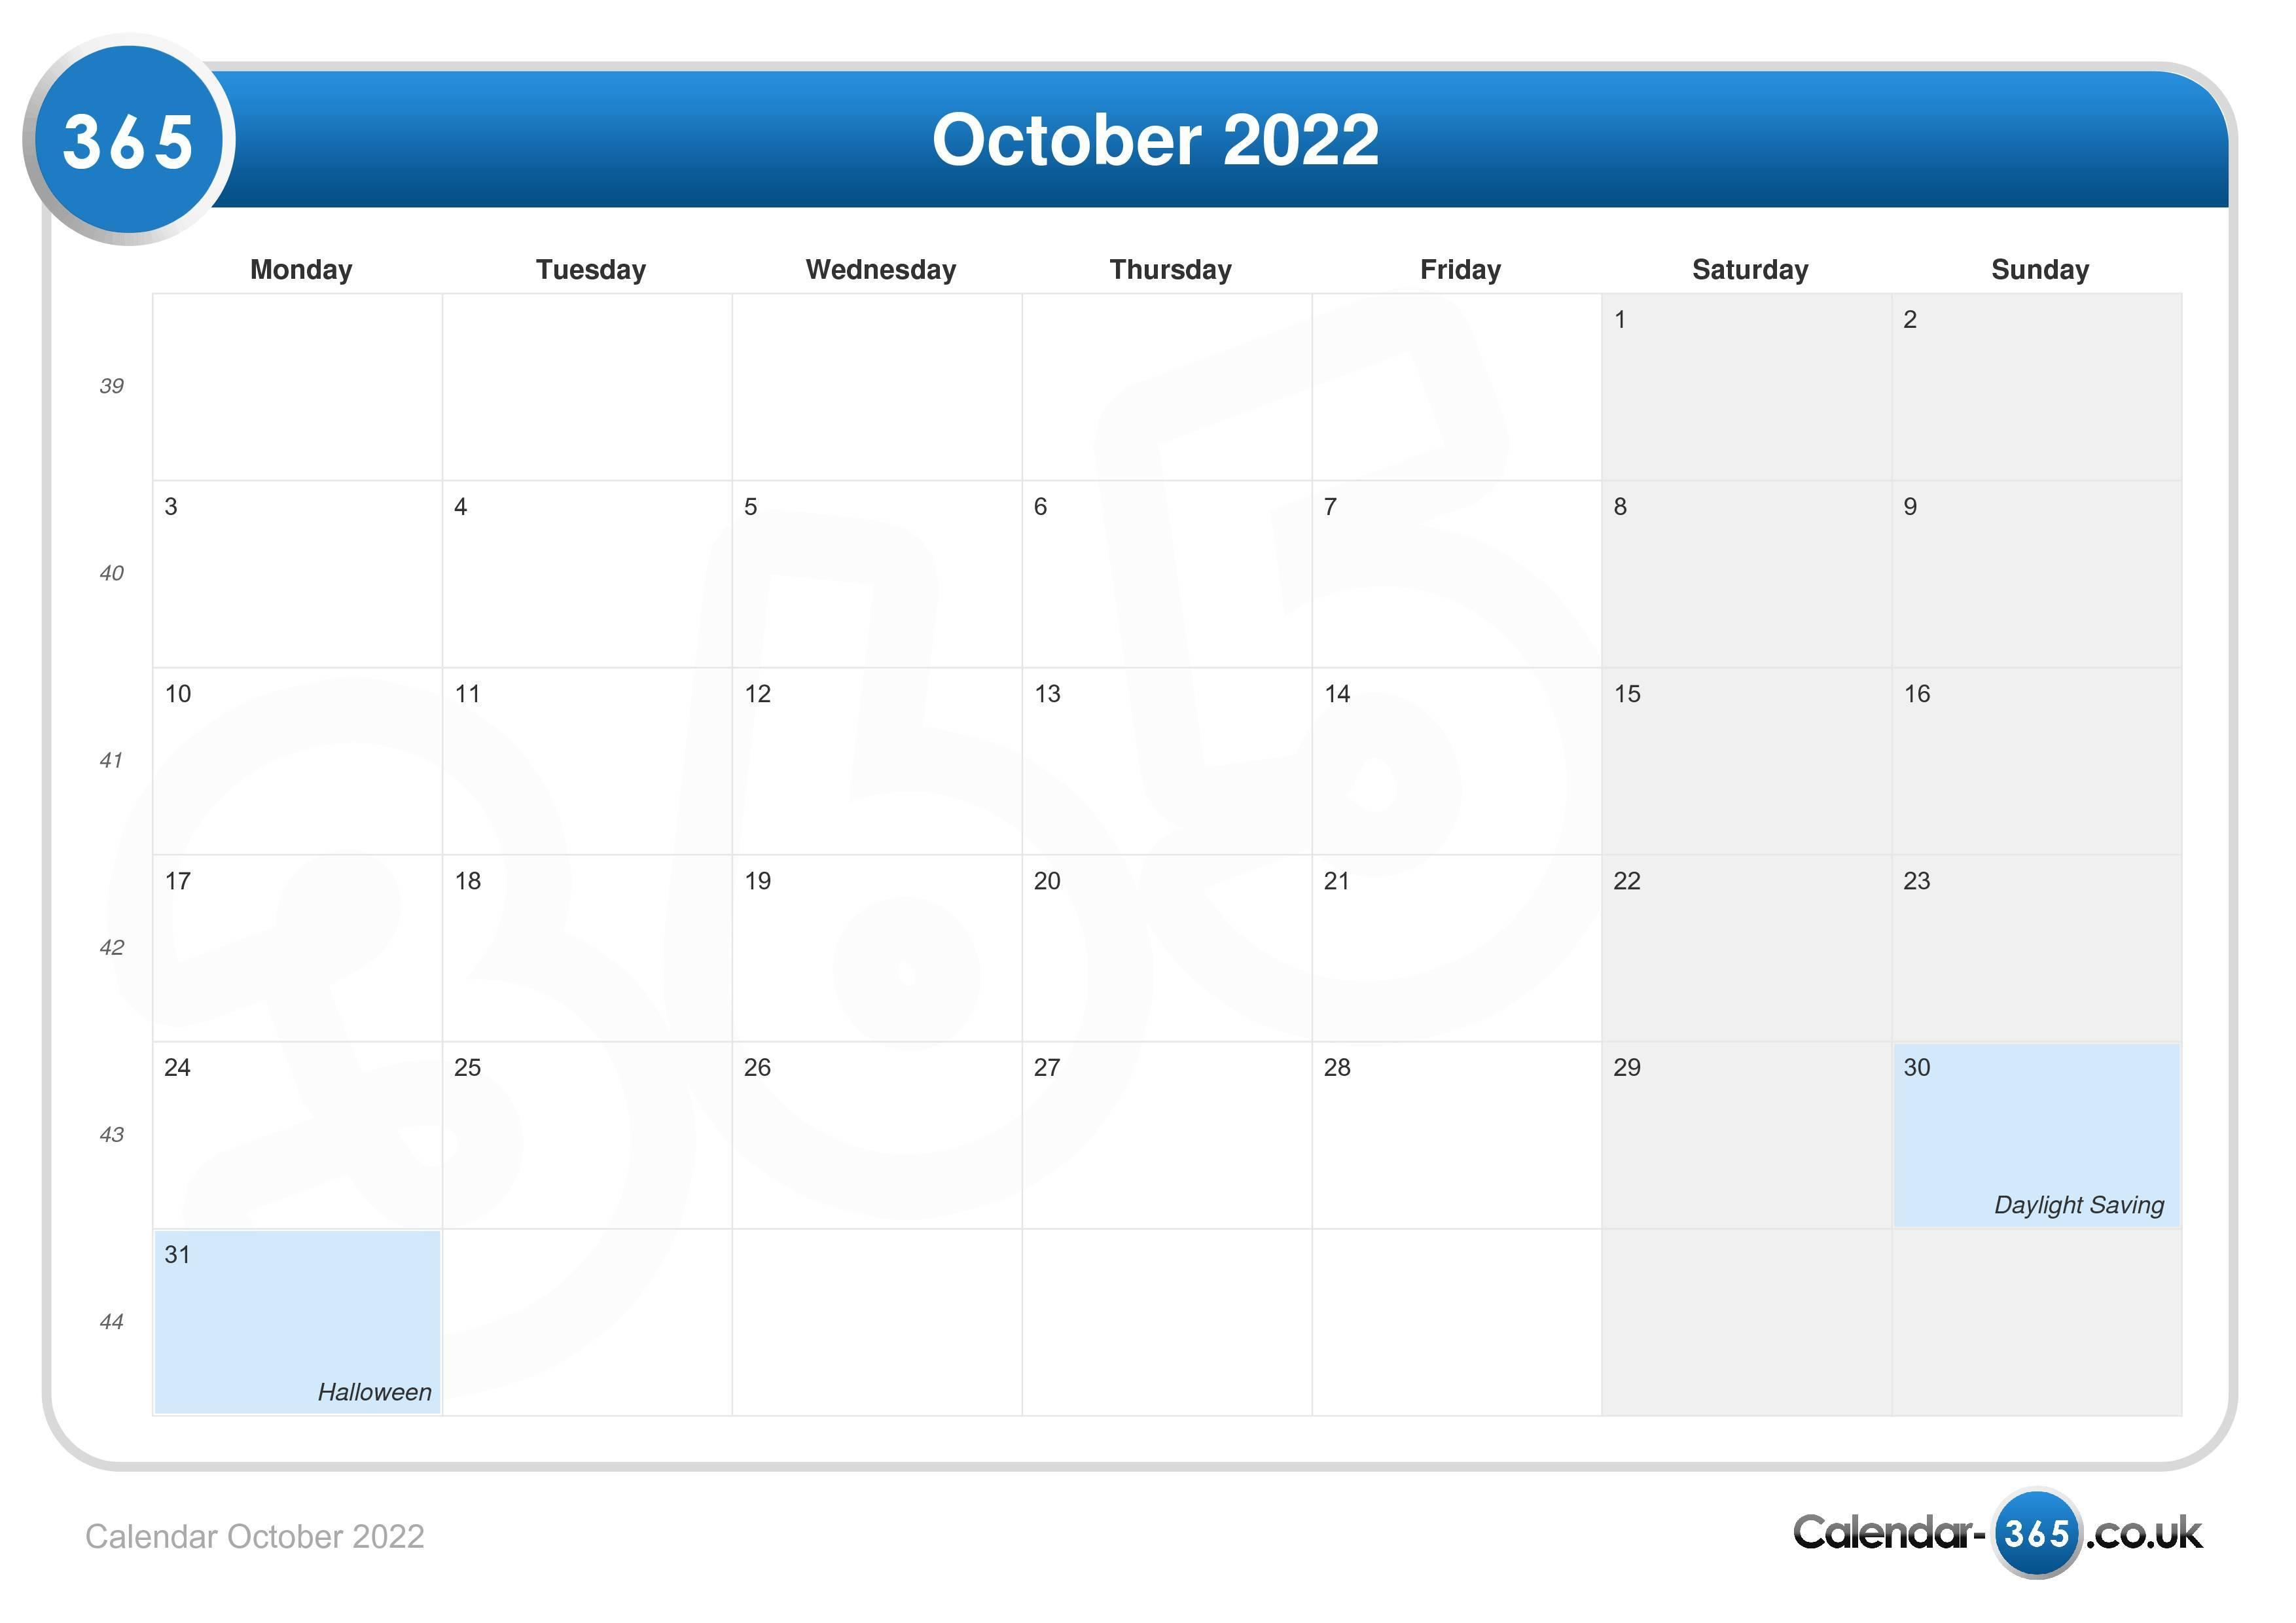 Lunar Calendar October 2022.Calendar October 2022